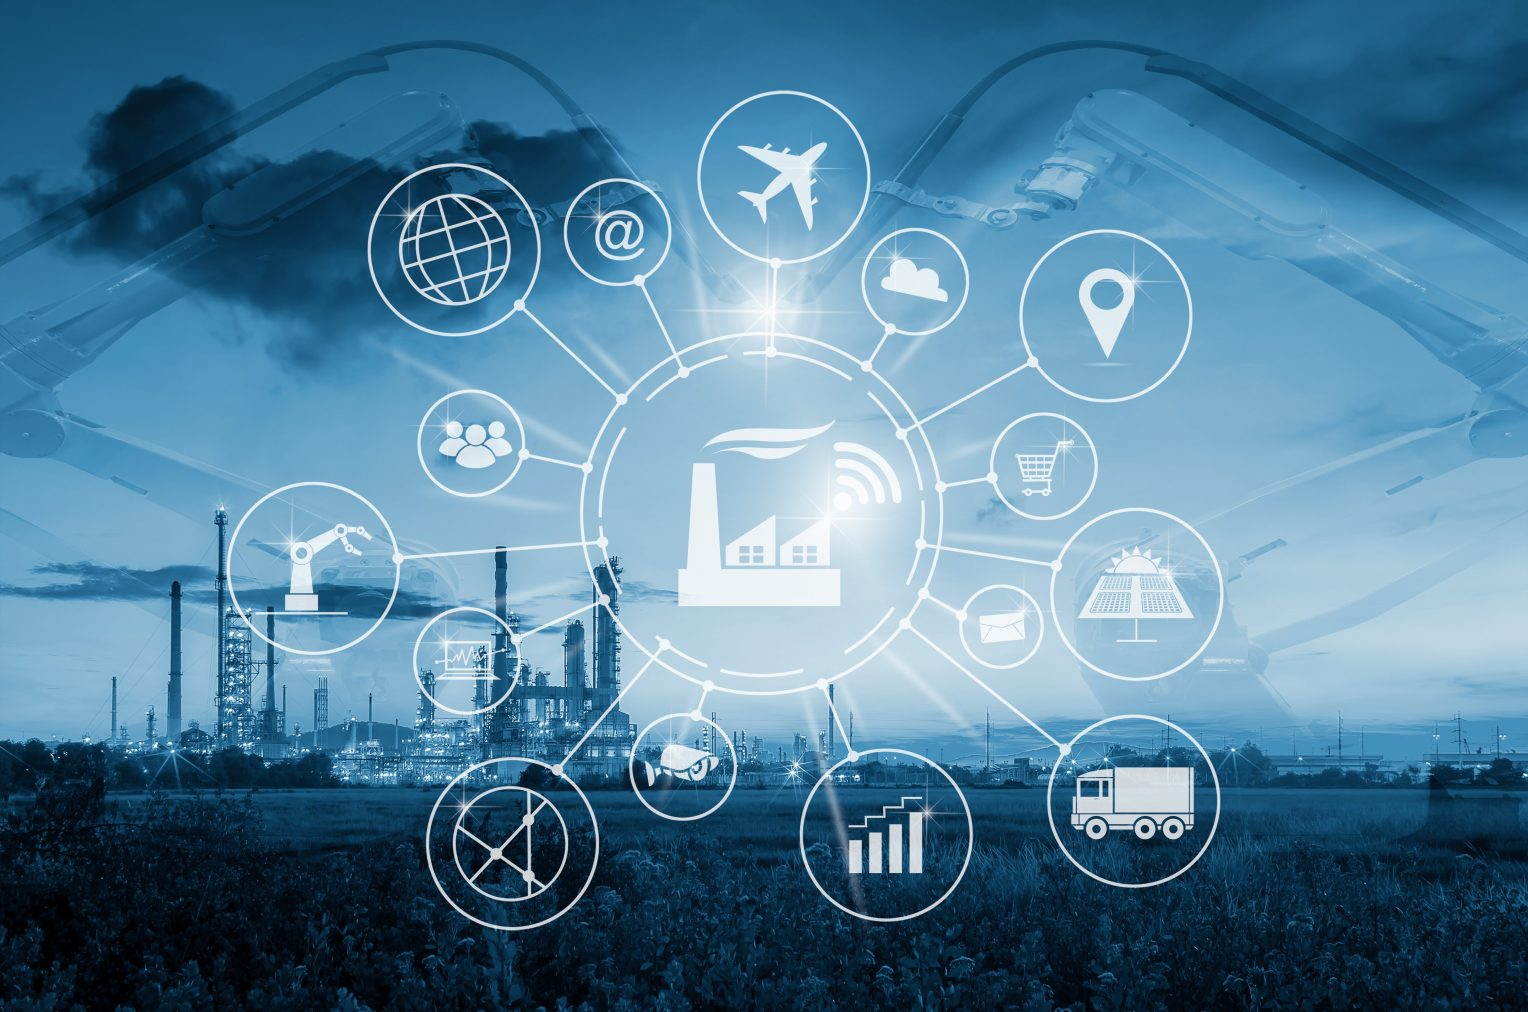 Different industries